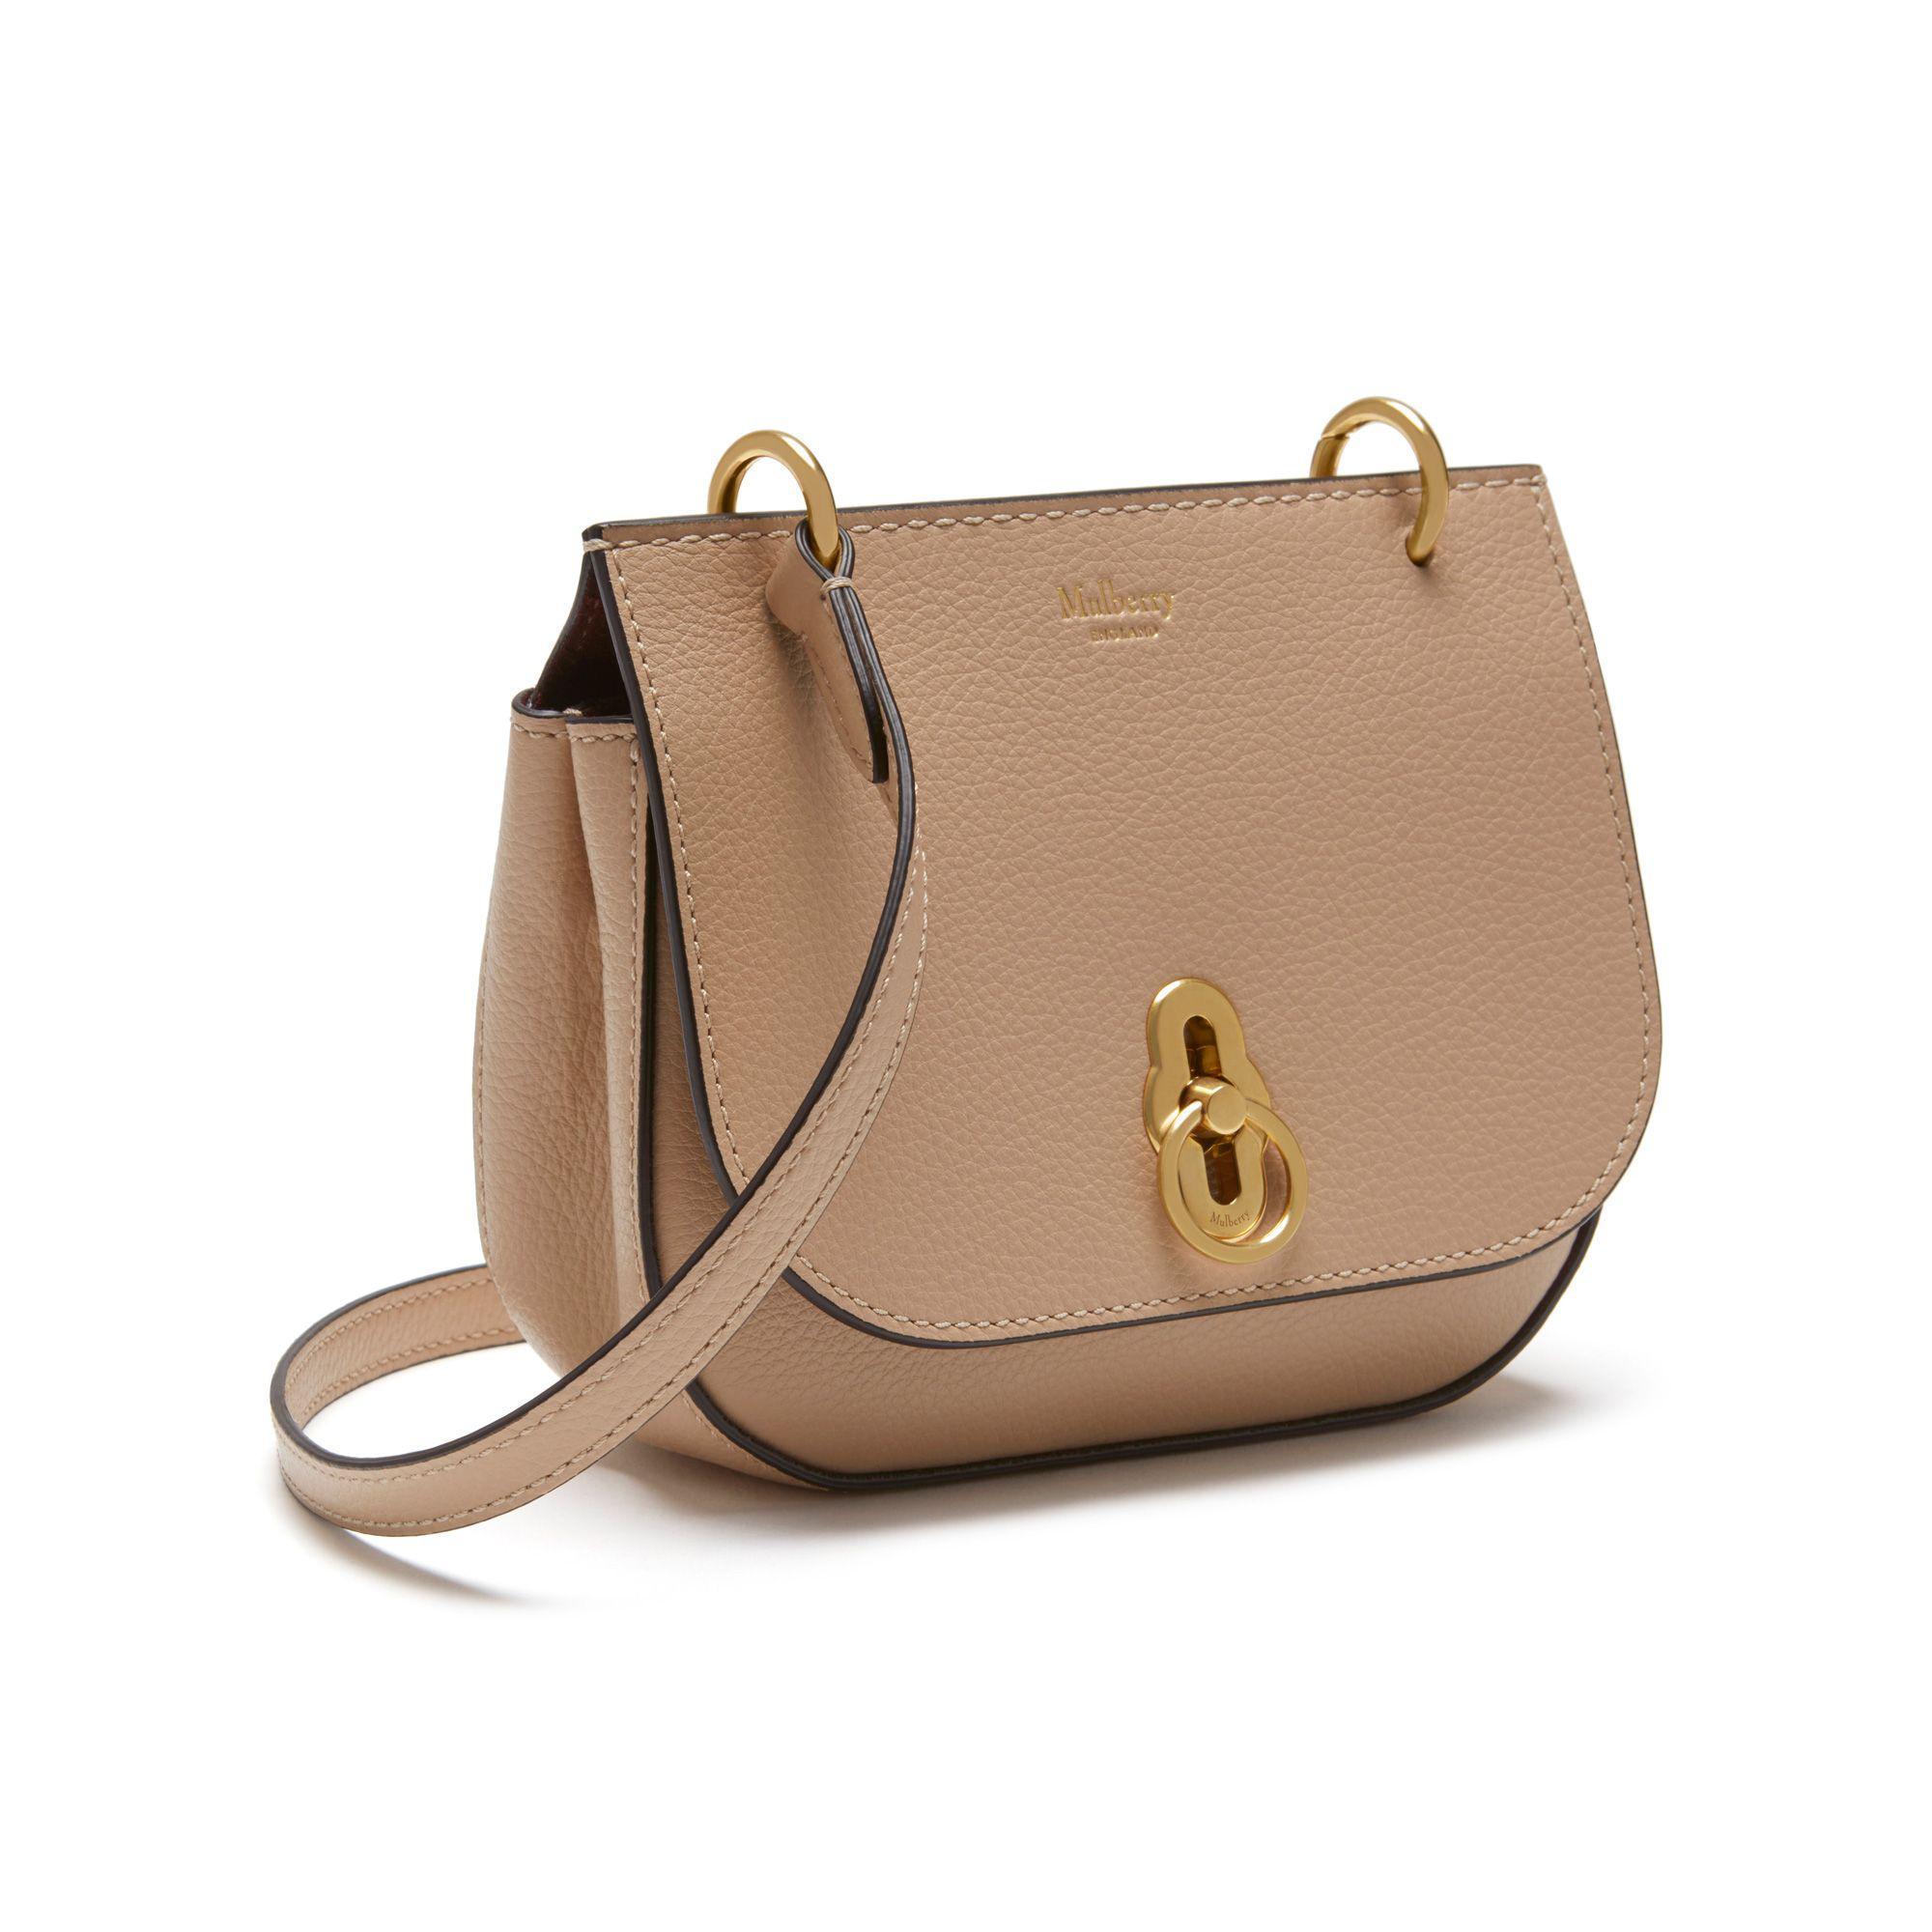 74de7d6b1c0e order mulberry black mini amberley satchel lyst. view fullscreen e9d87 0cdd3